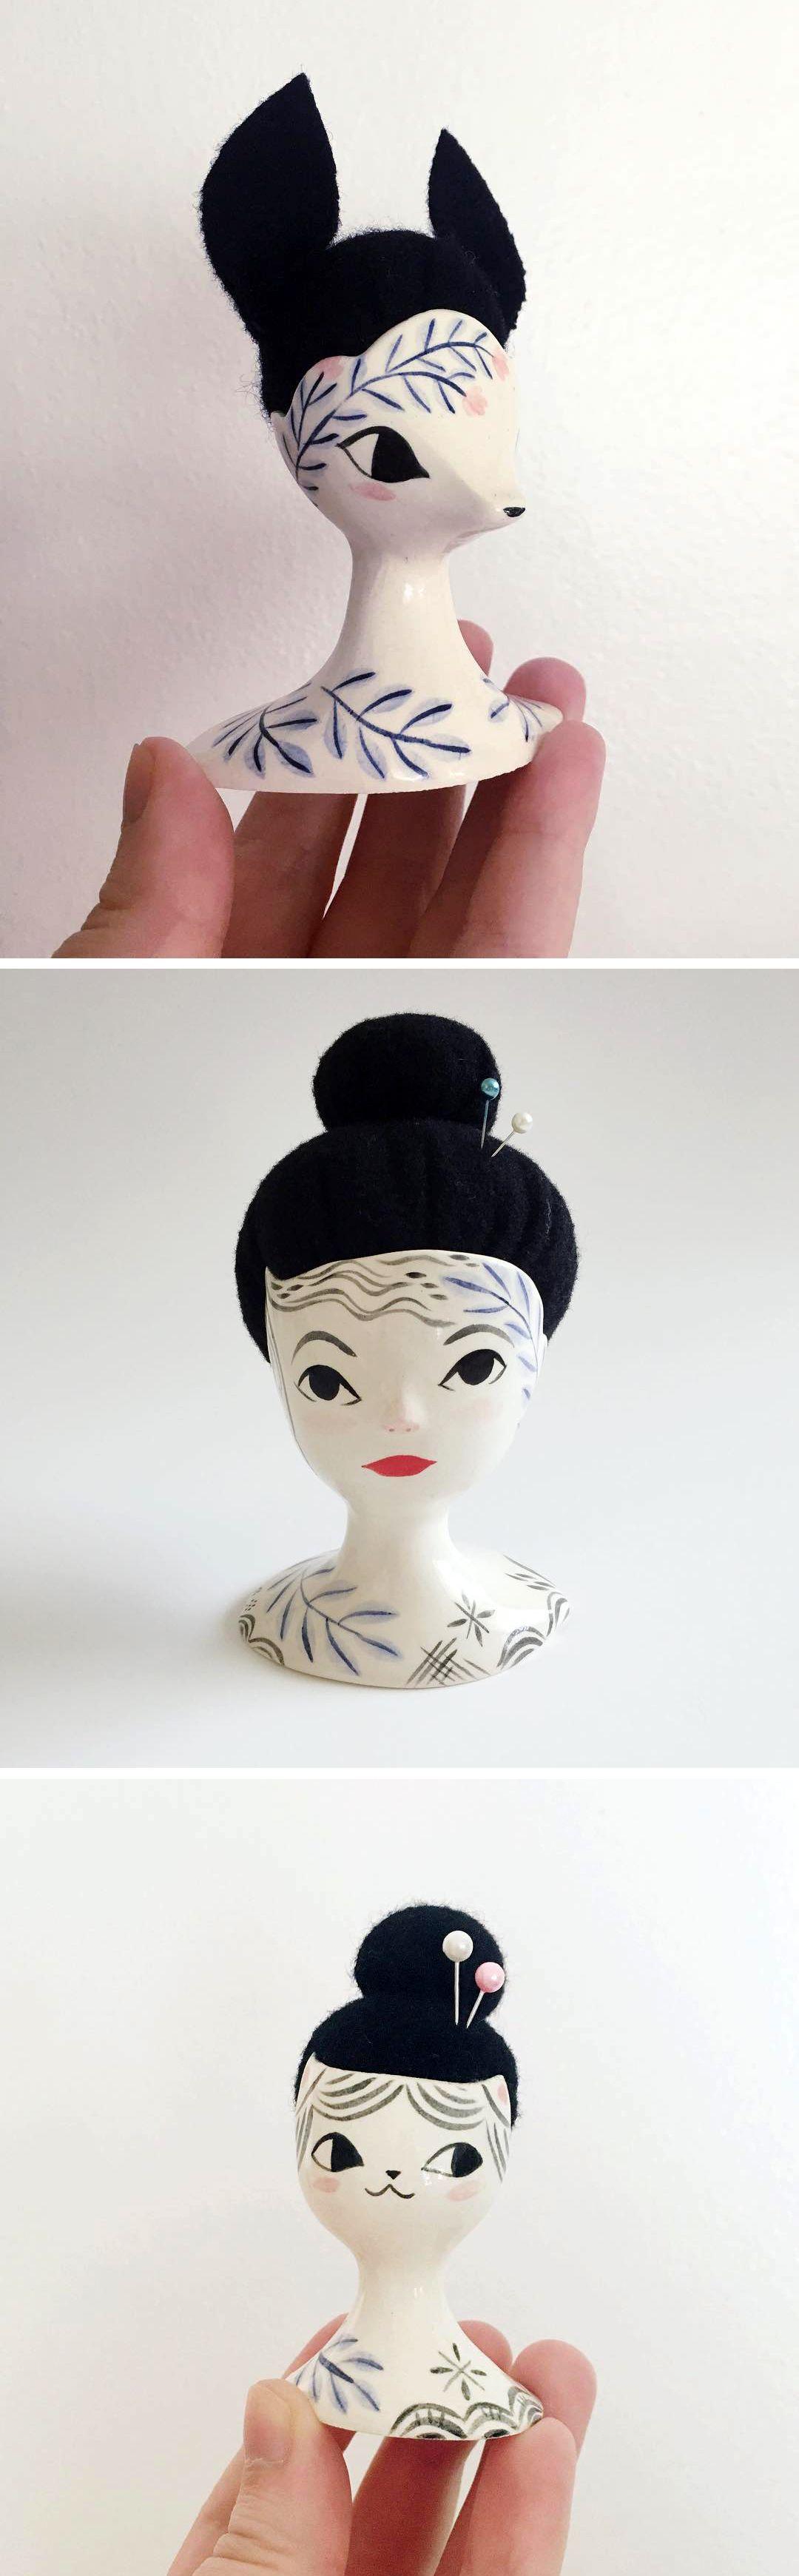 Bespoke pin cushions by Erin Paisely // pincushions // pincushion // ceramic pin cushion // face vase